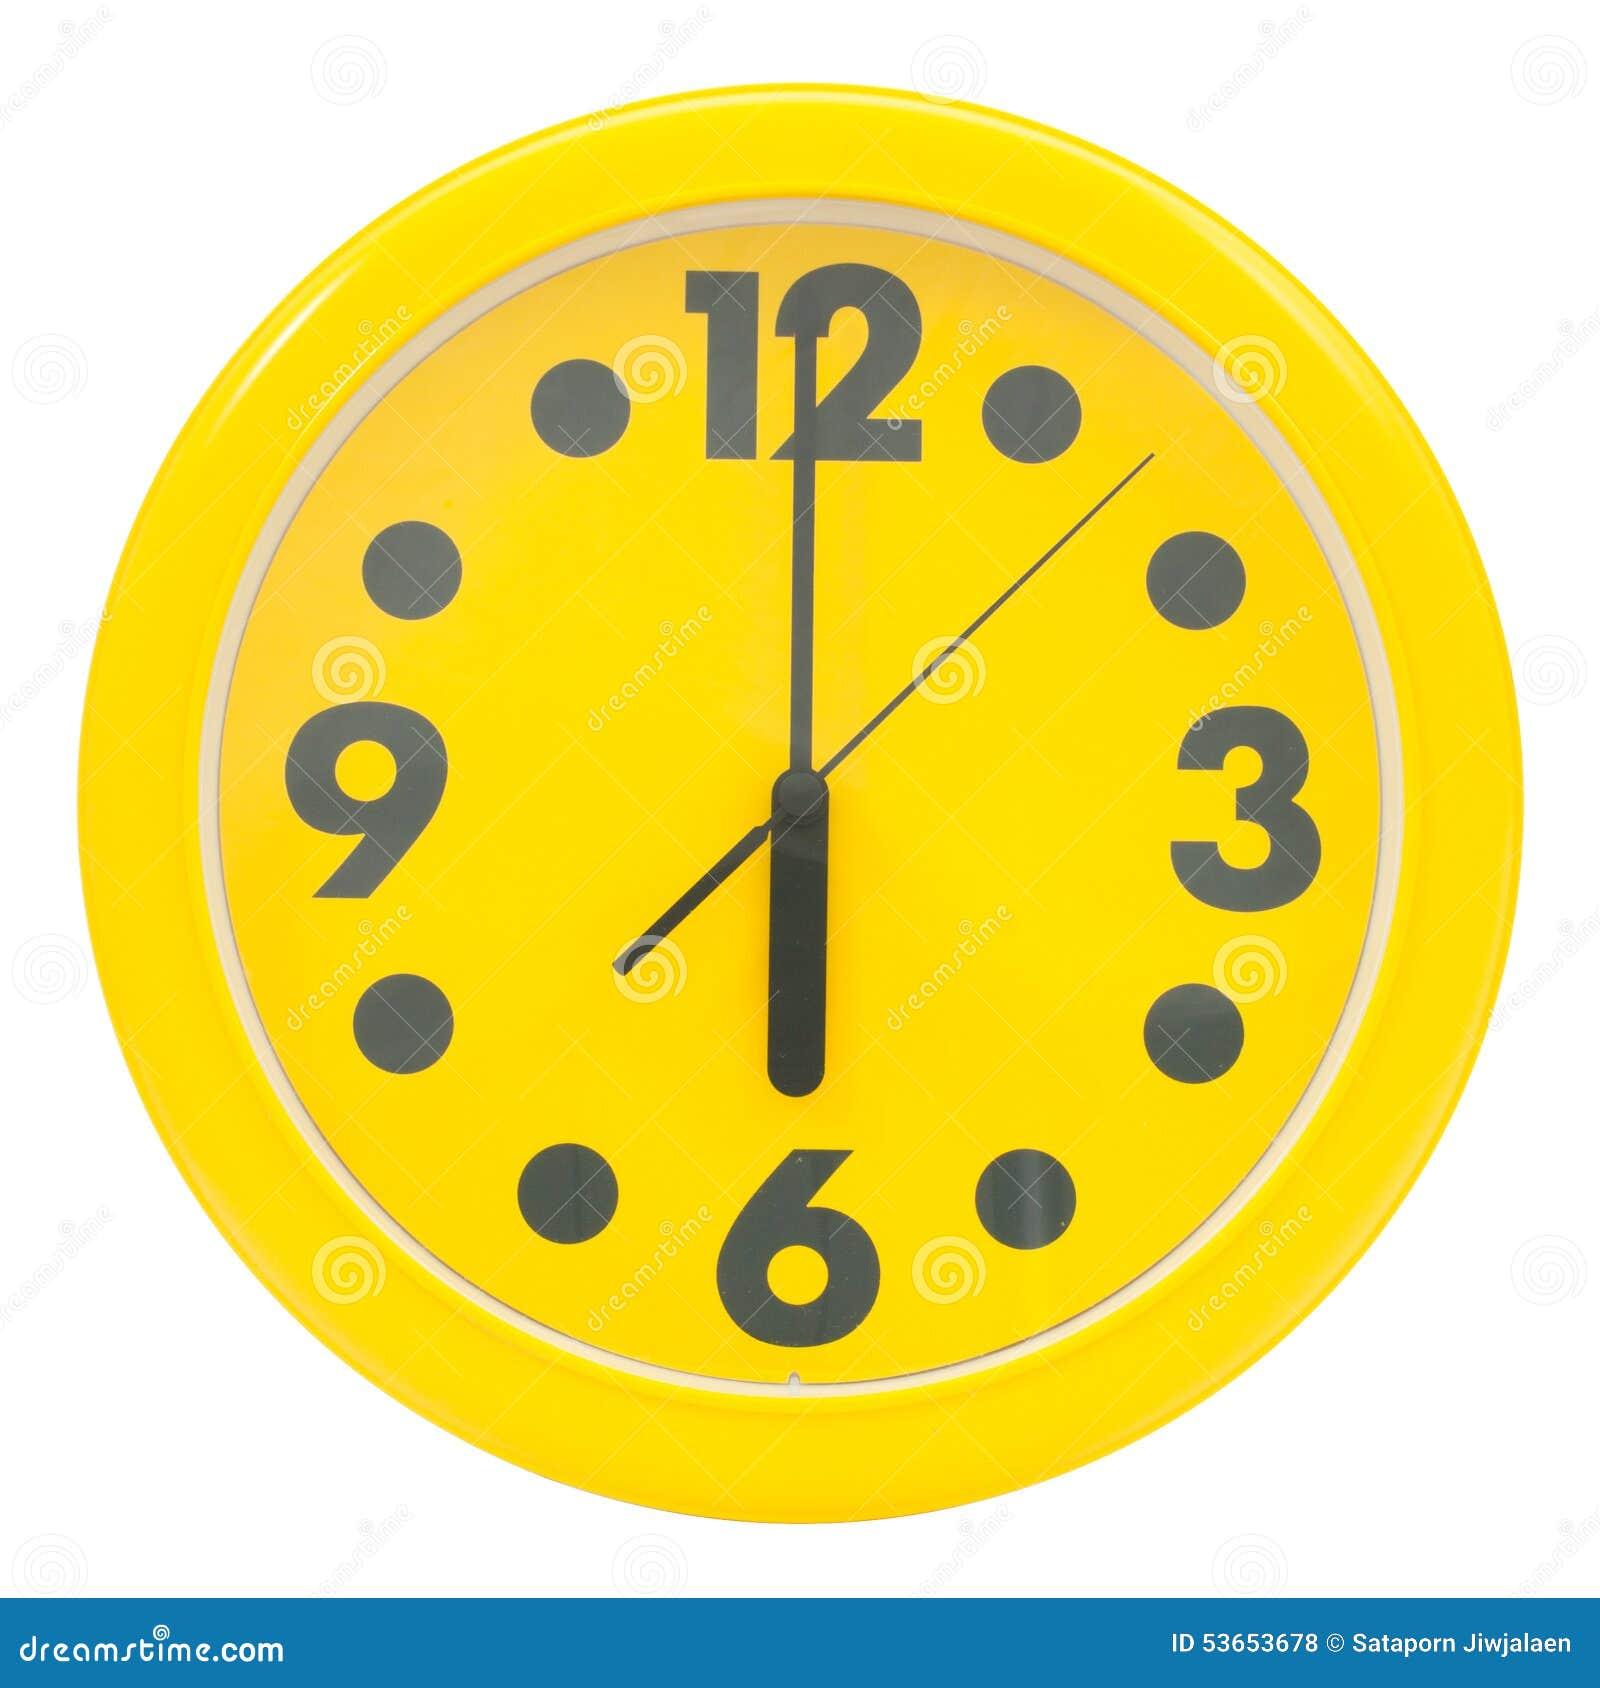 Reloj de pared amarillo foto de archivo imagen 53653678 - Mecanismo para reloj de pared ...